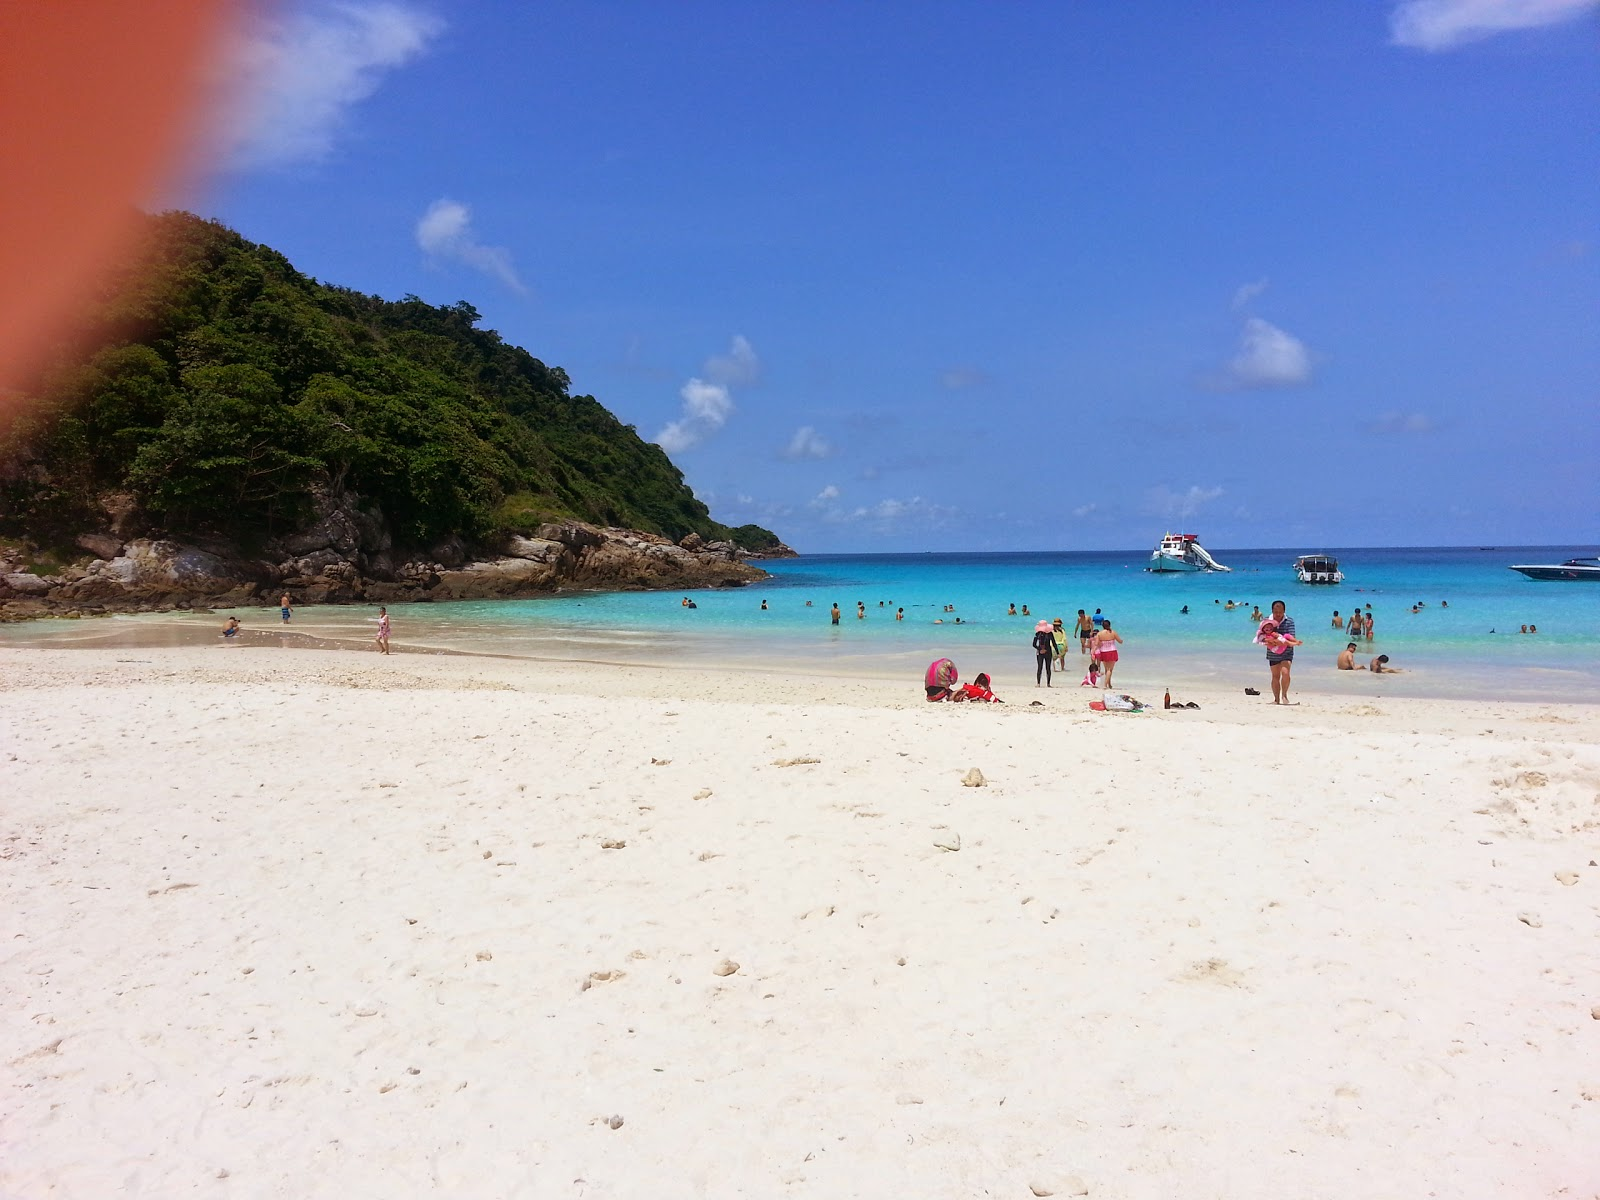 Raya Yai island - Phuket